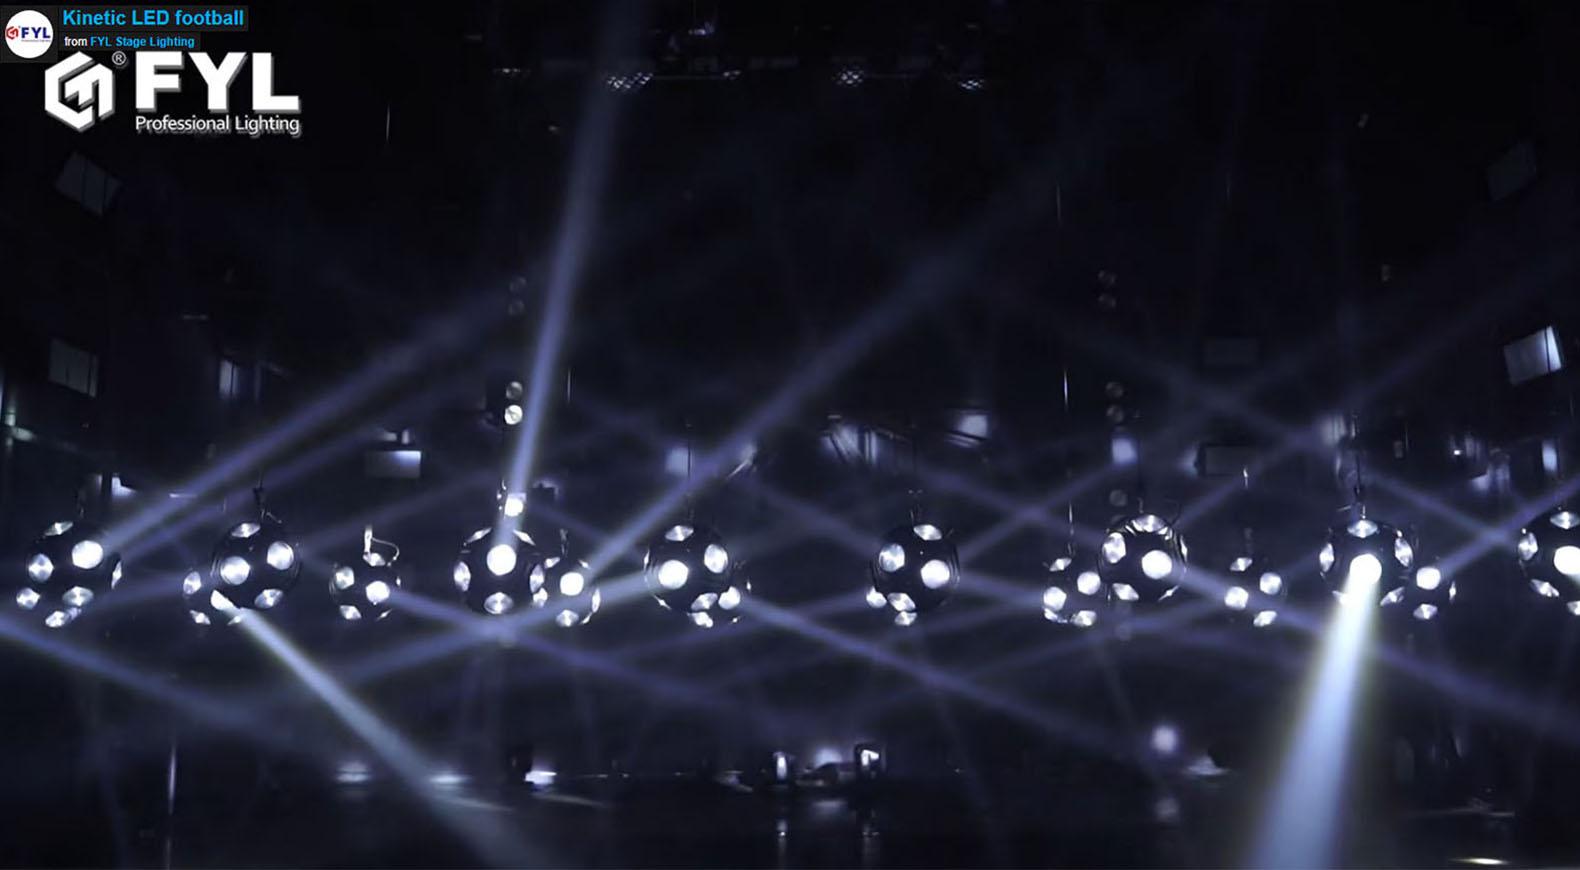 Kinetic LED Football